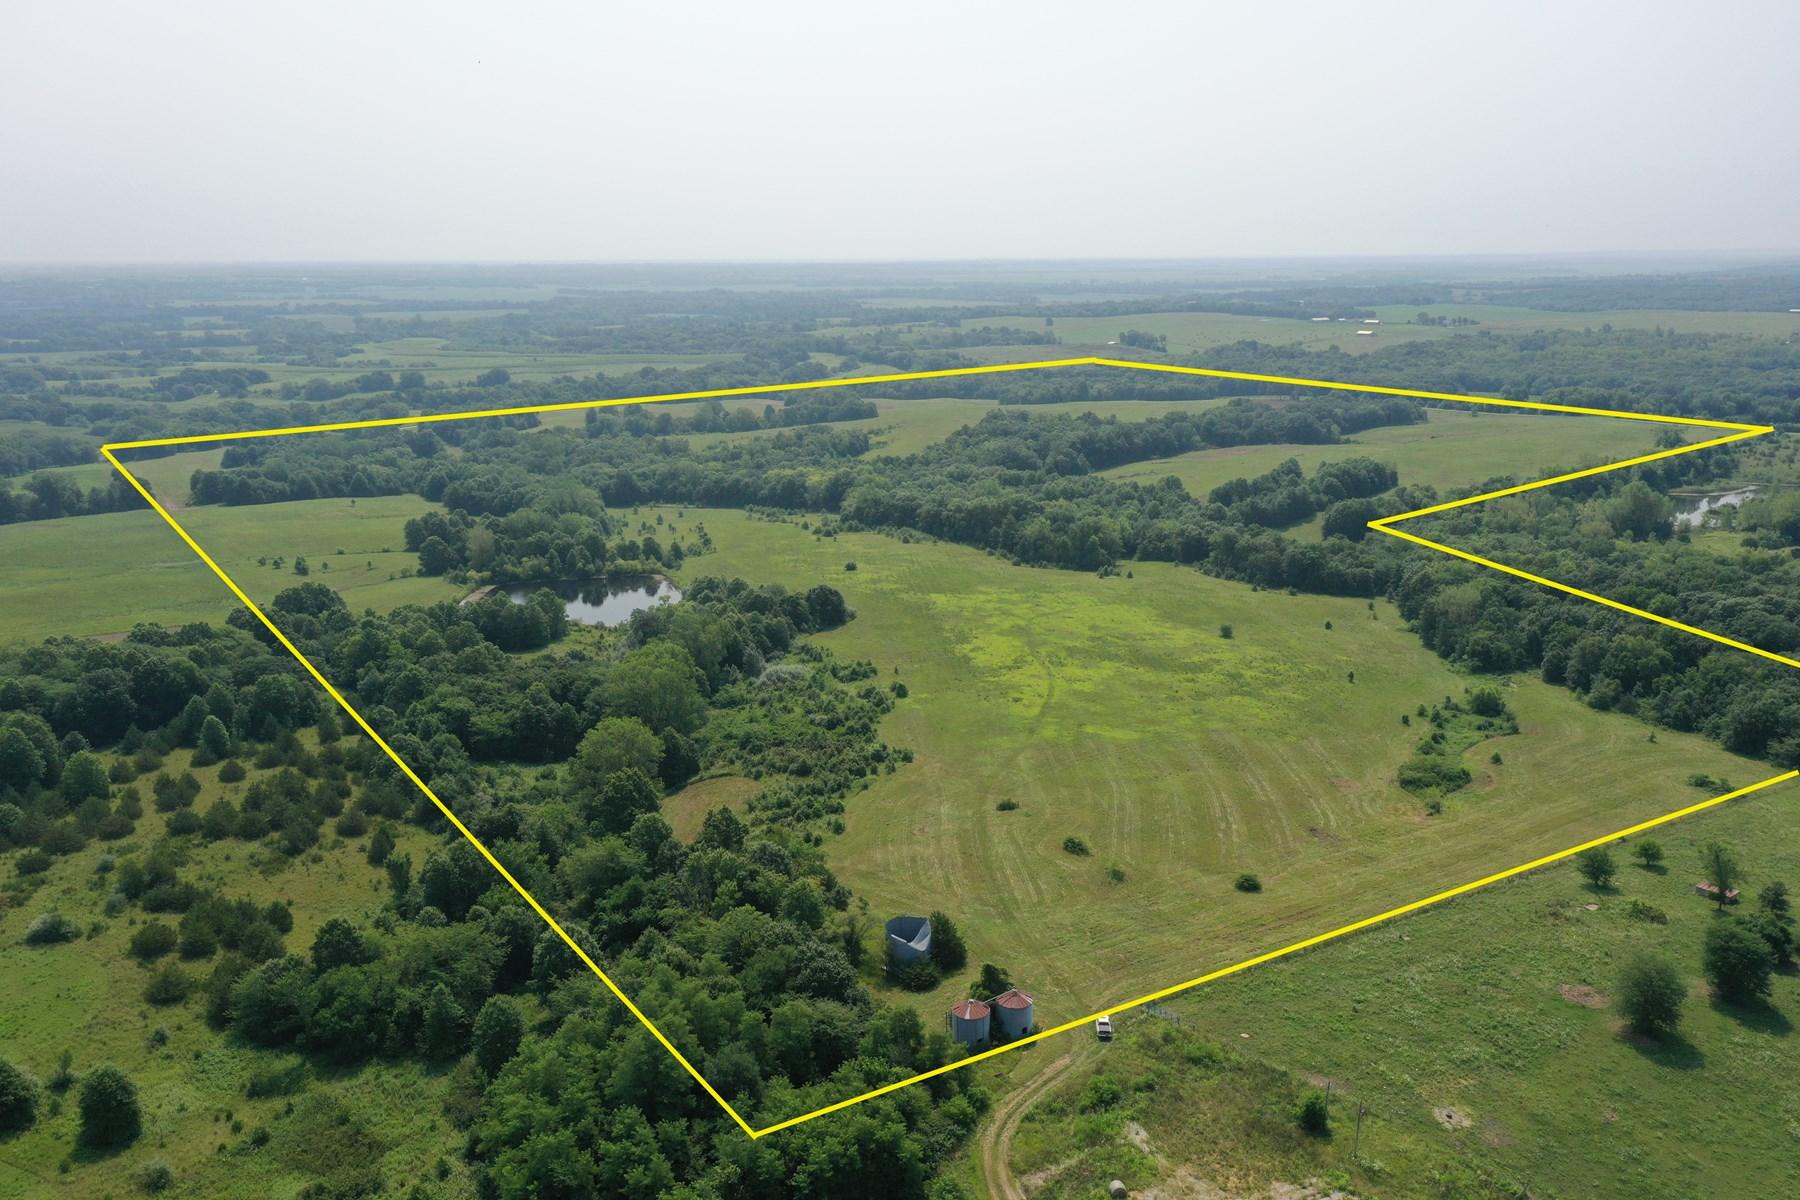 For Sale 185 Acre m/l Hunting Farm